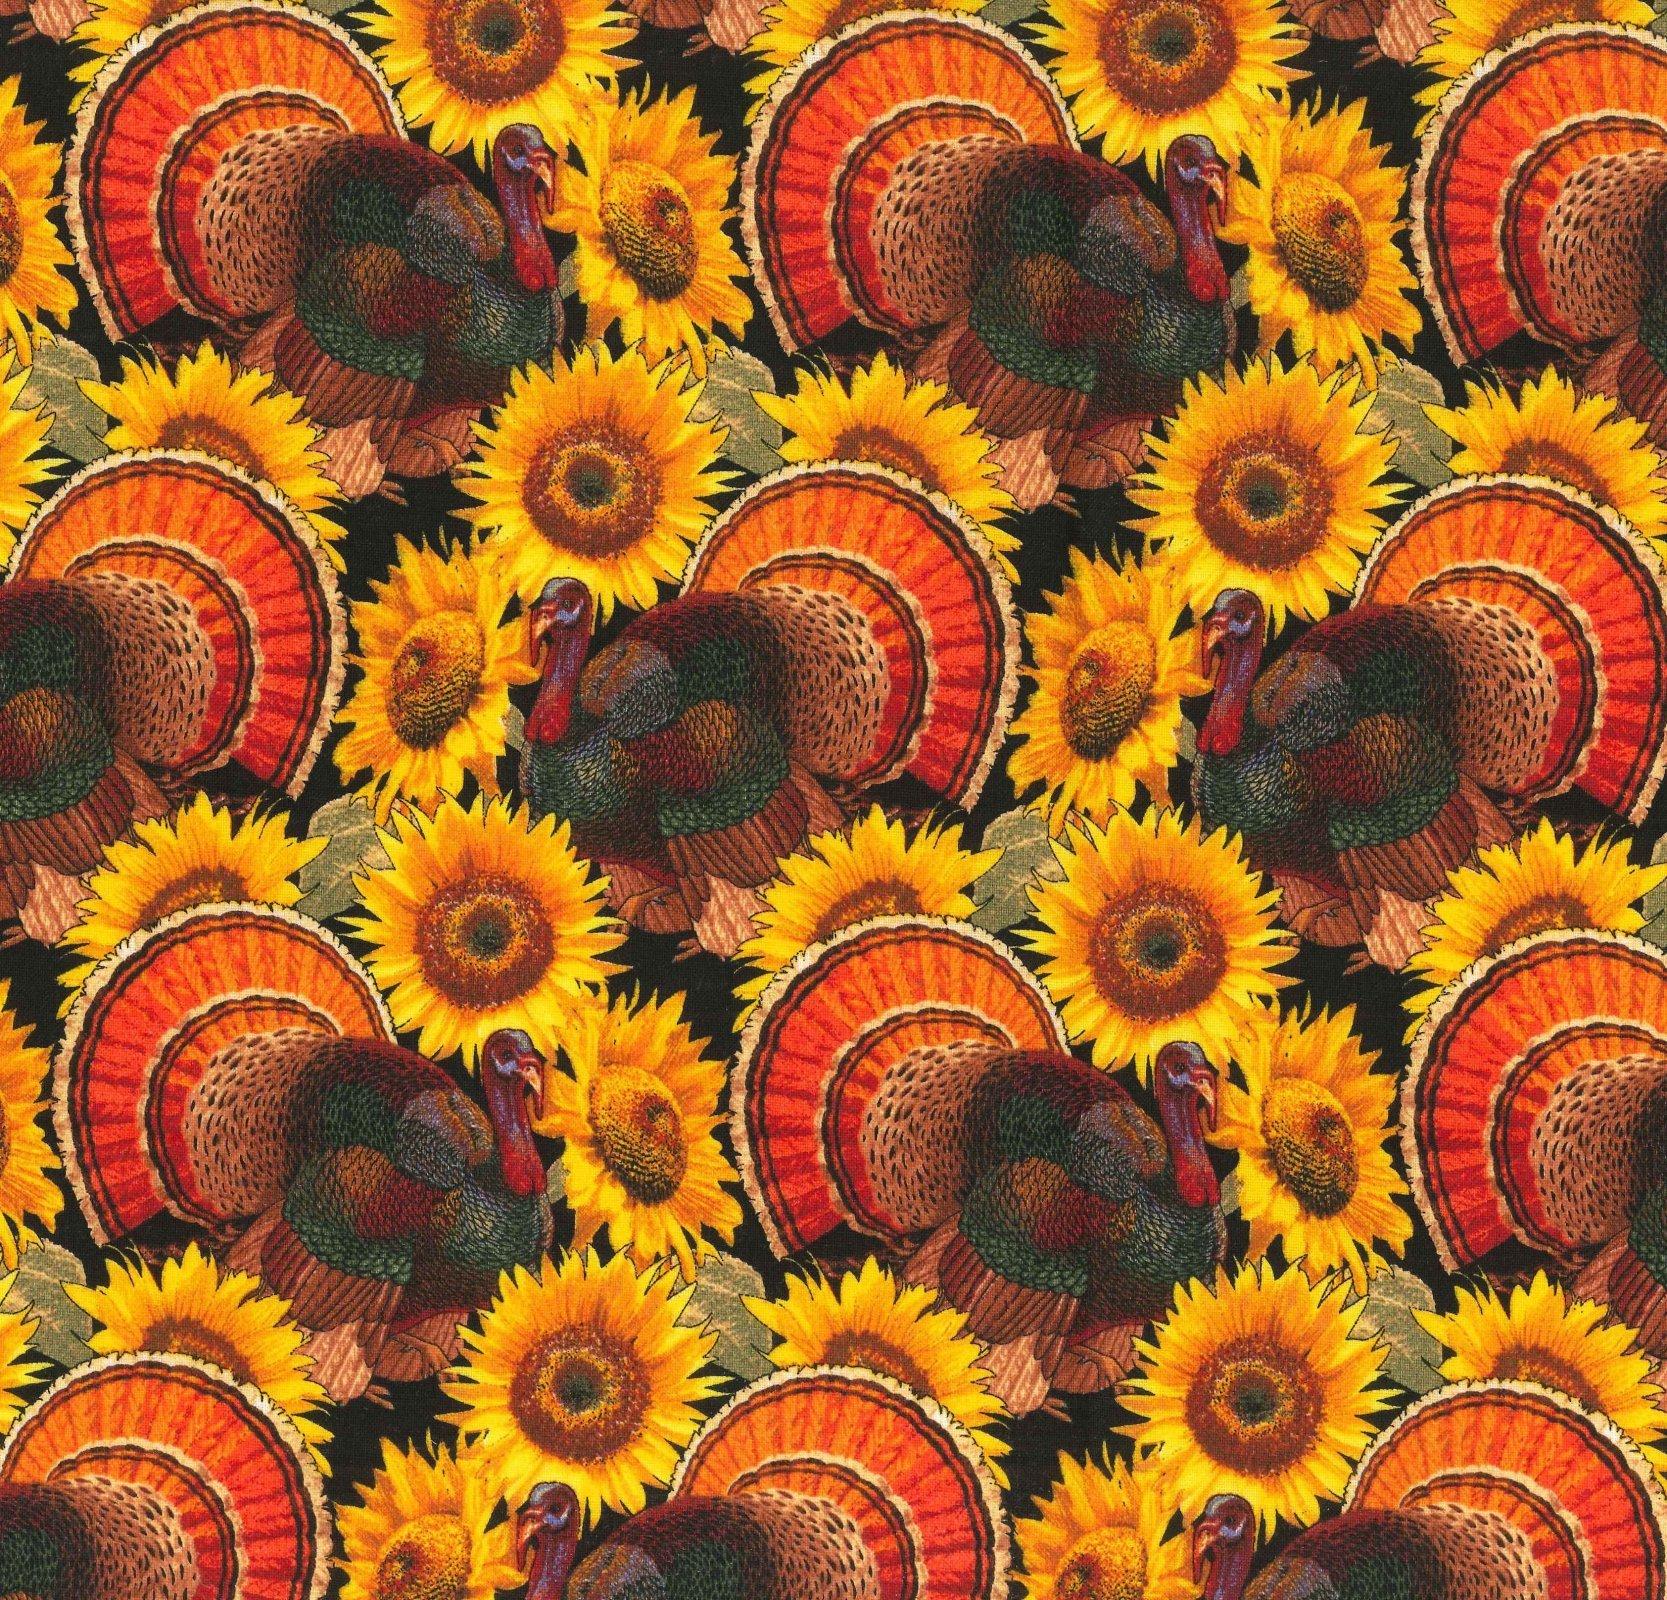 Turkeys & Sunflowers 17813